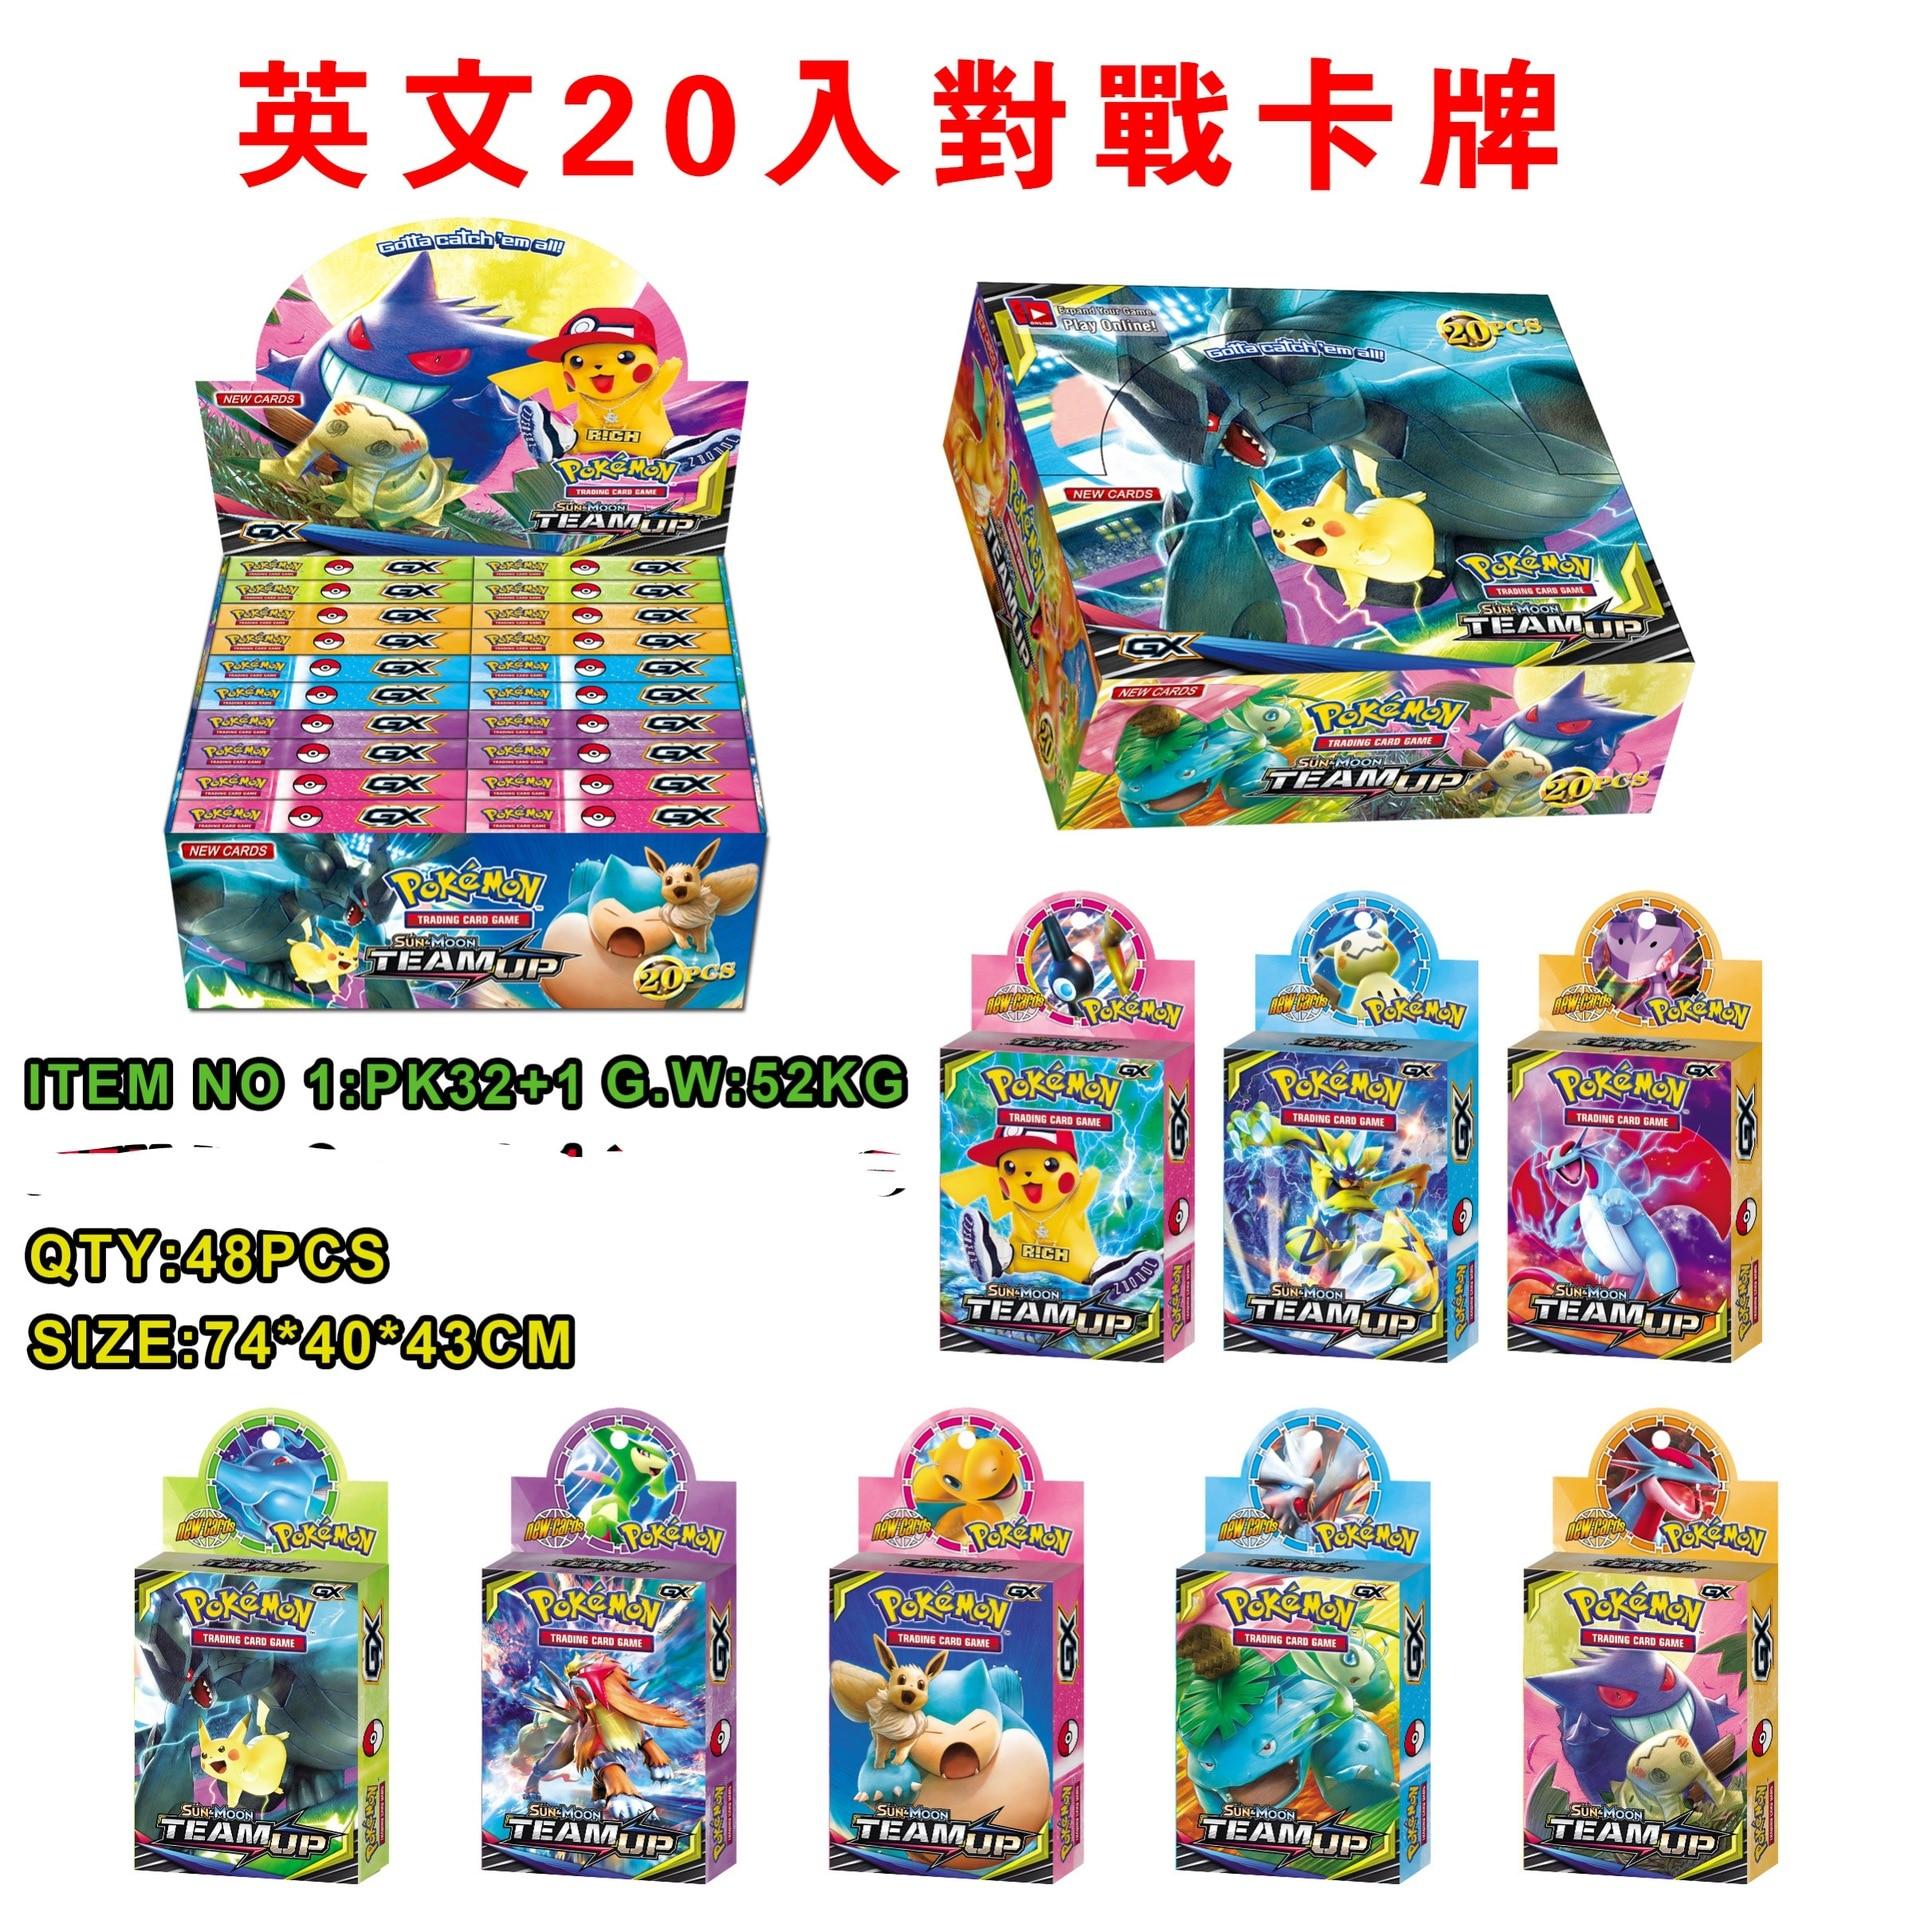 500 pcs mais novo takara tomy animais de estimacao pokemon cartoes contem cartao flash pokemon equipe